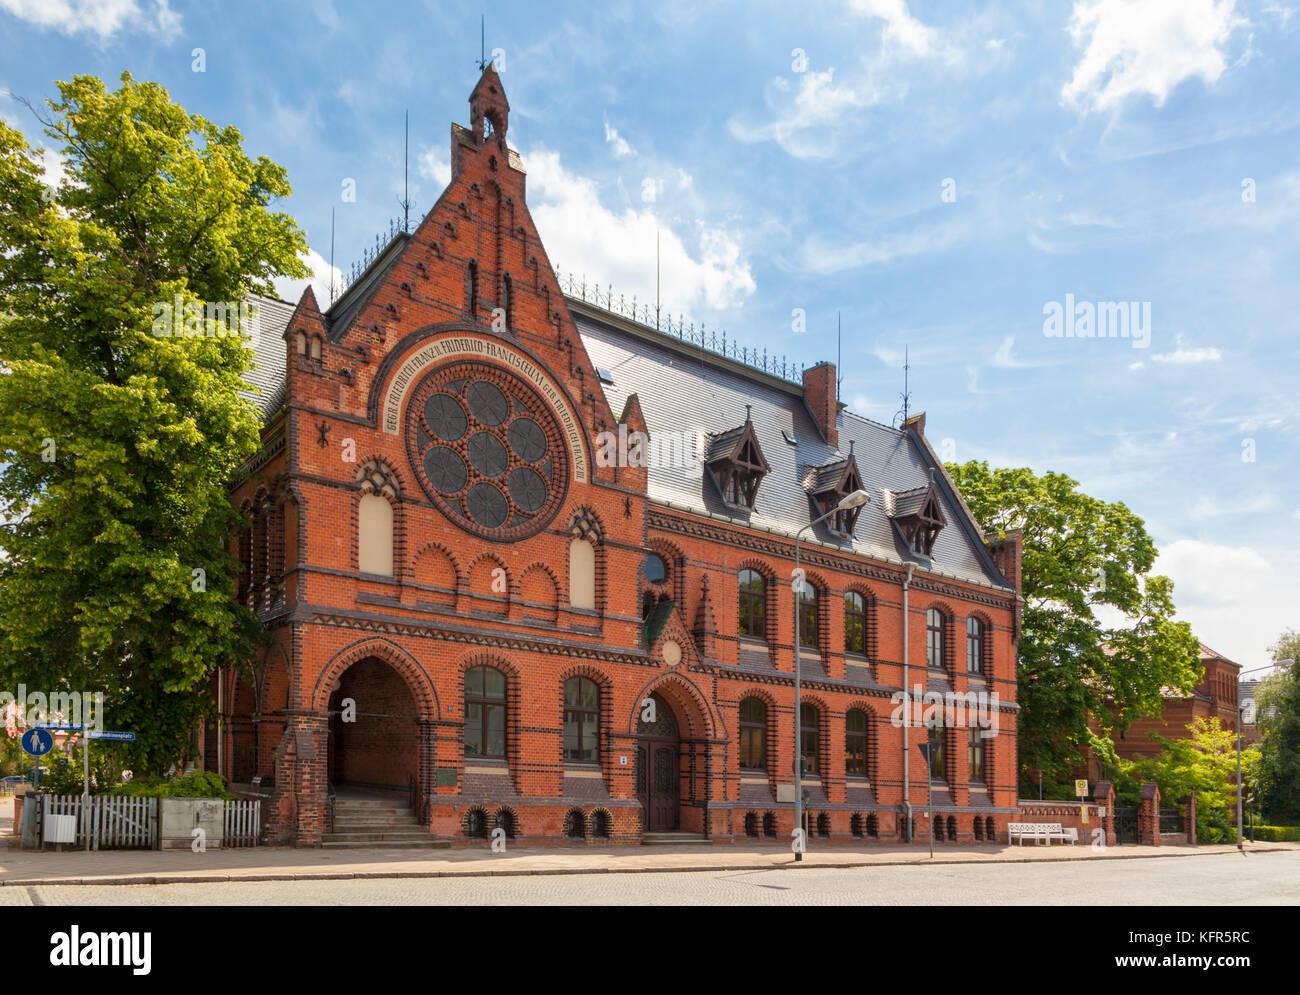 Friderico Francisceum high school, Bad Doberan, Mecklenburg-West Pomerania, Germany - Stock Image